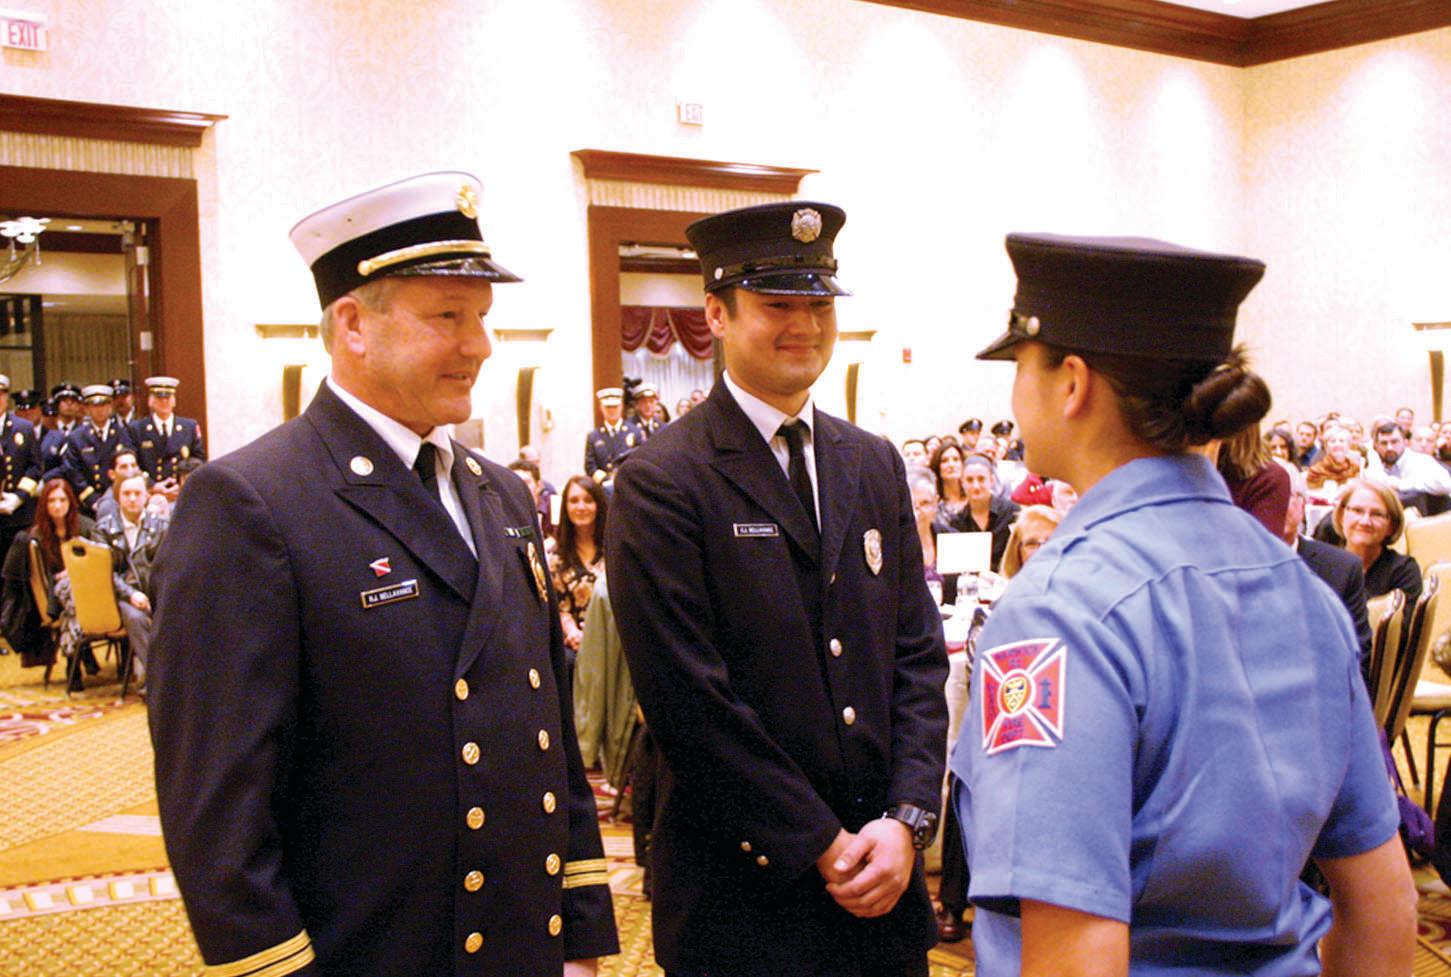 24 join ranks of Fire Department | RhodyBeat